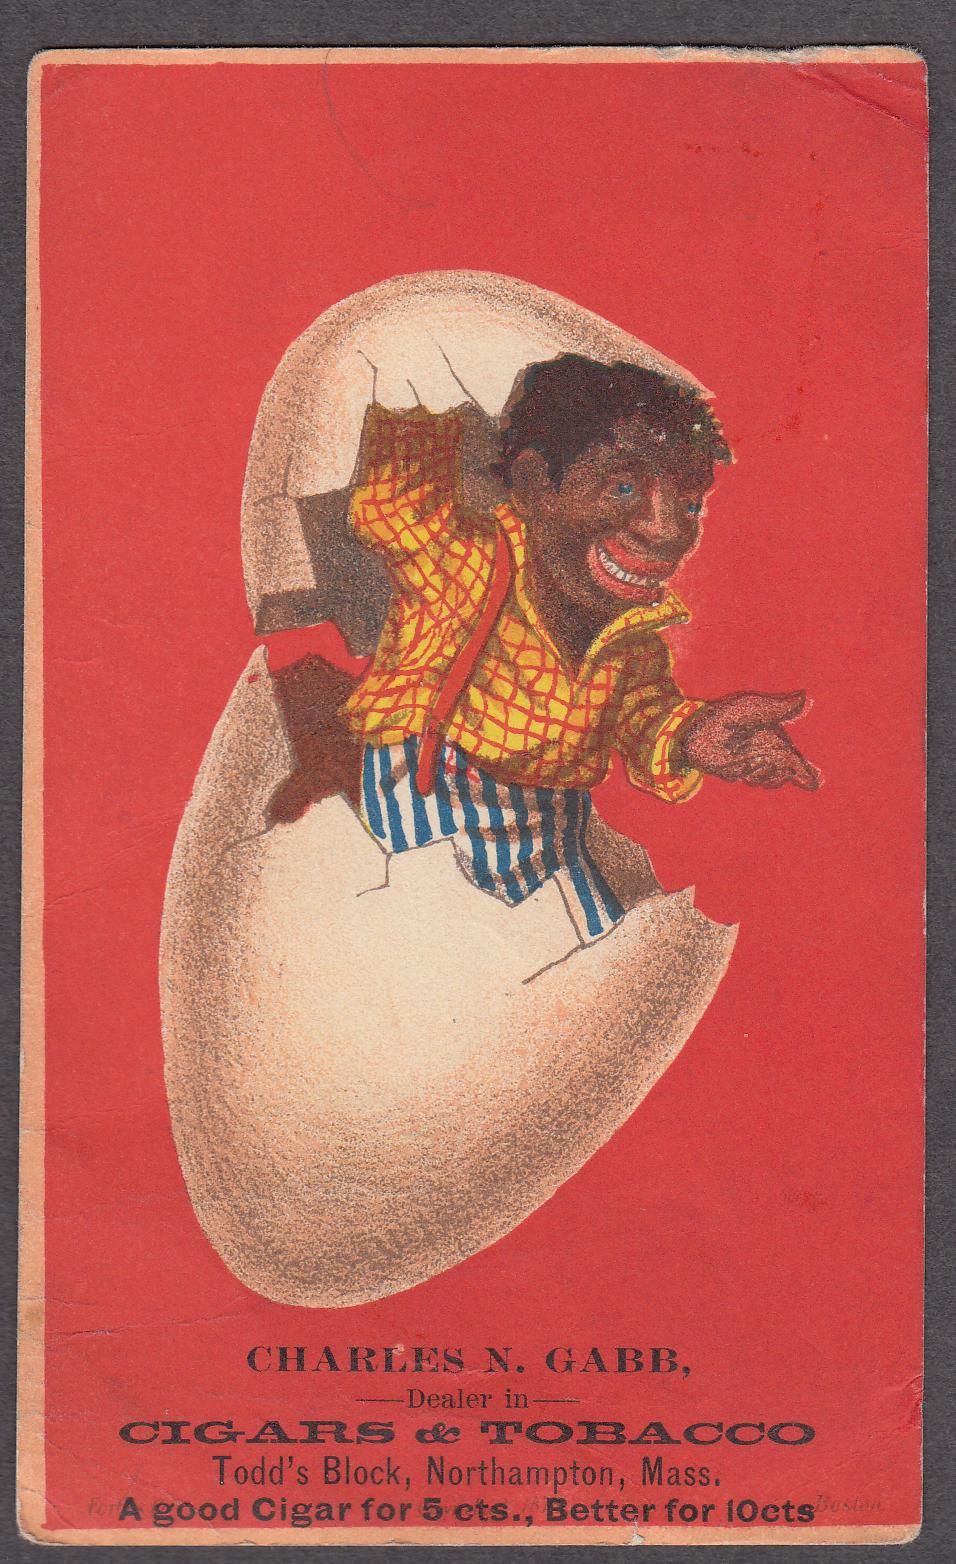 Charles N Gabb Cigars Tobacco Northampton MA trade card 1880s black pops out egg